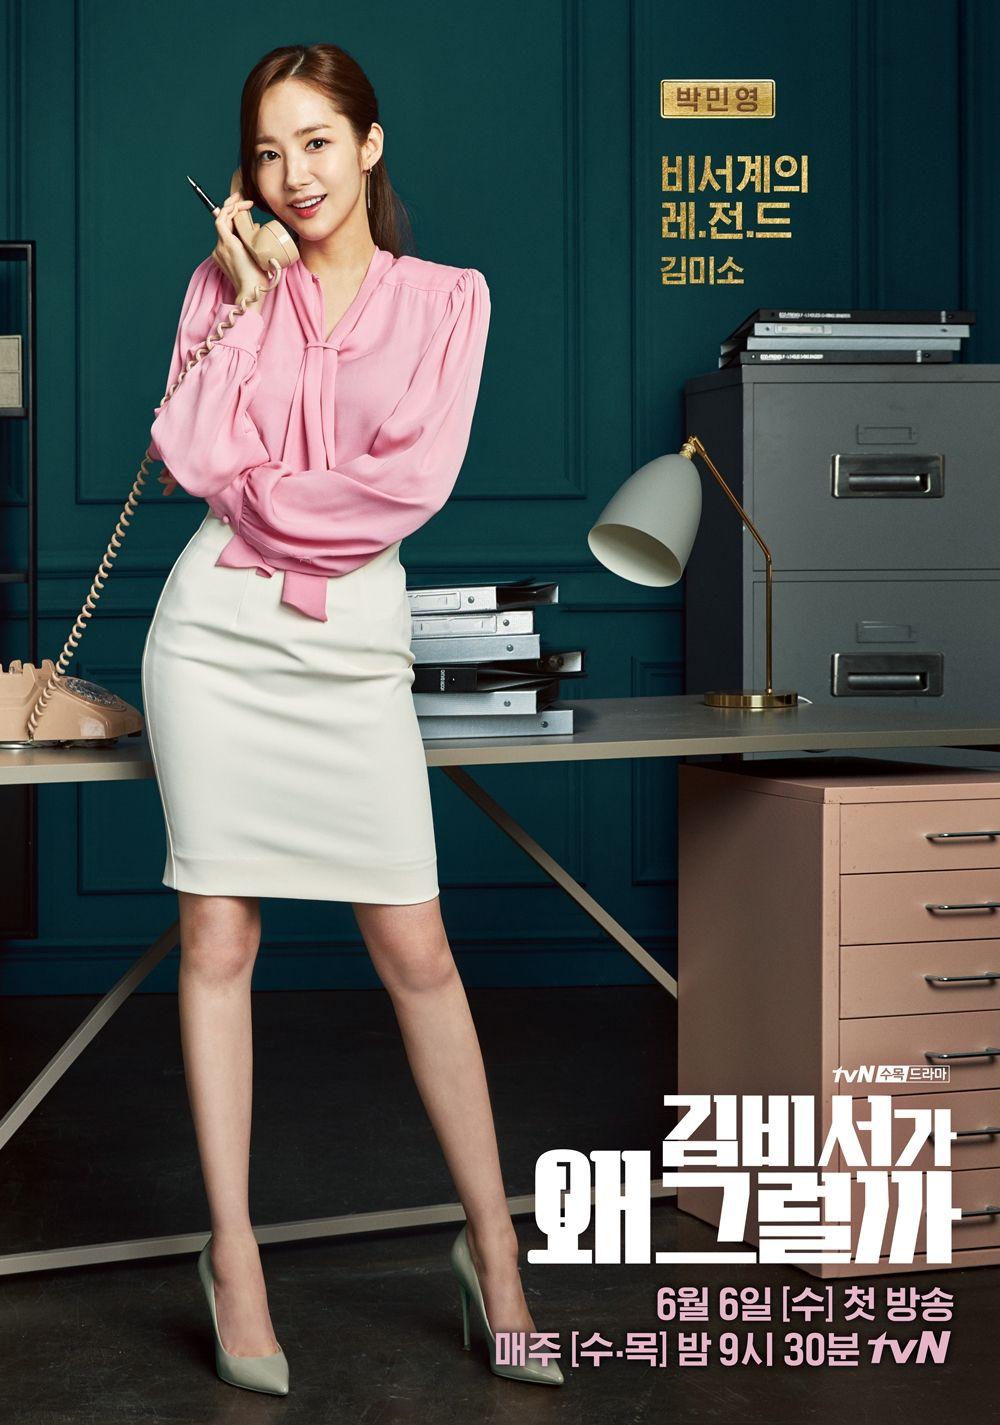 Oh yeon seo lee joon dating divas